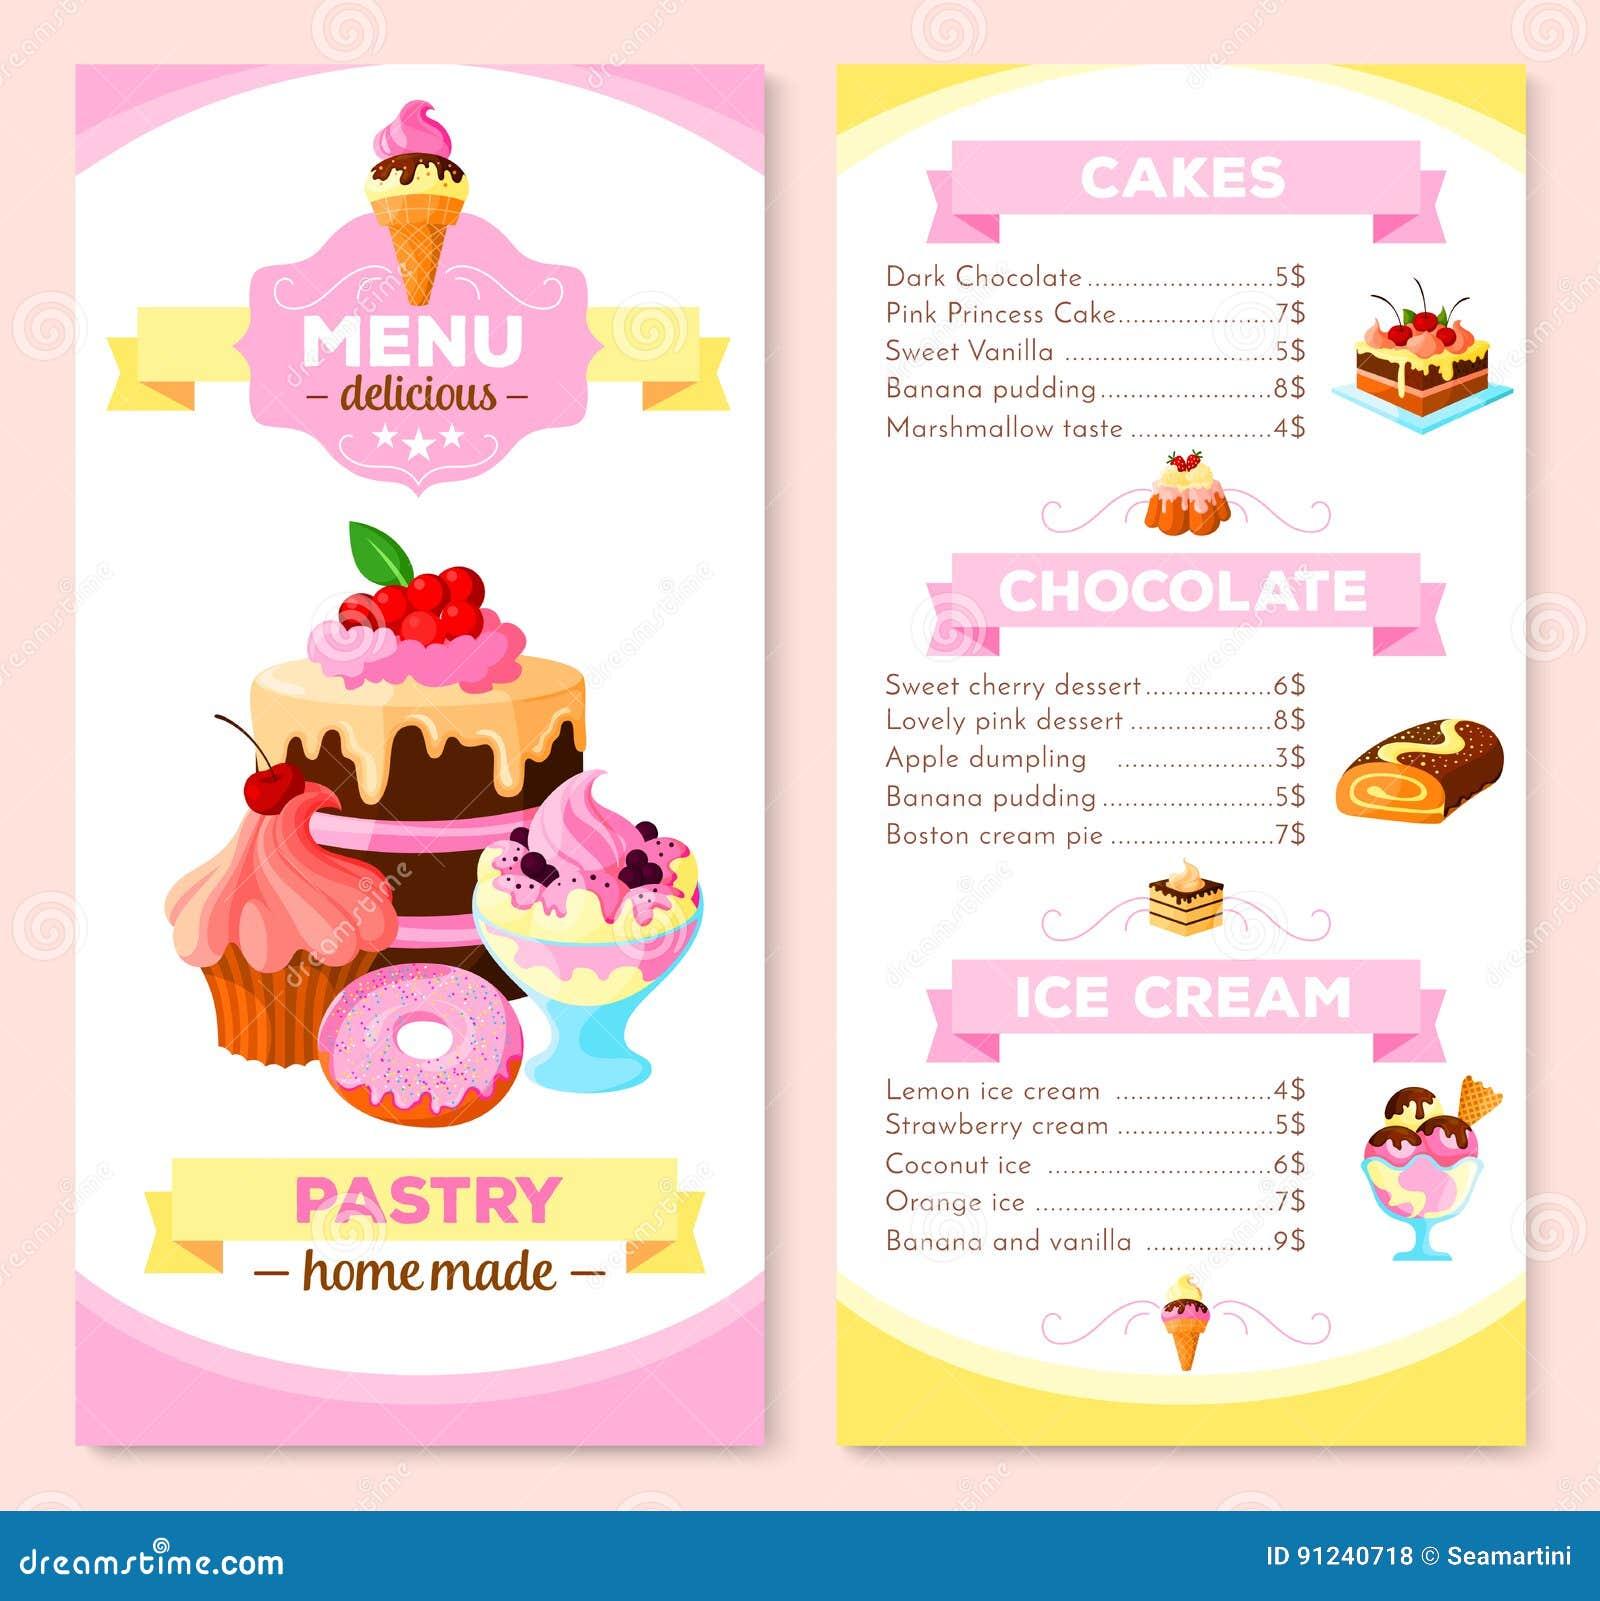 How To Price Homemade Cakes Uk